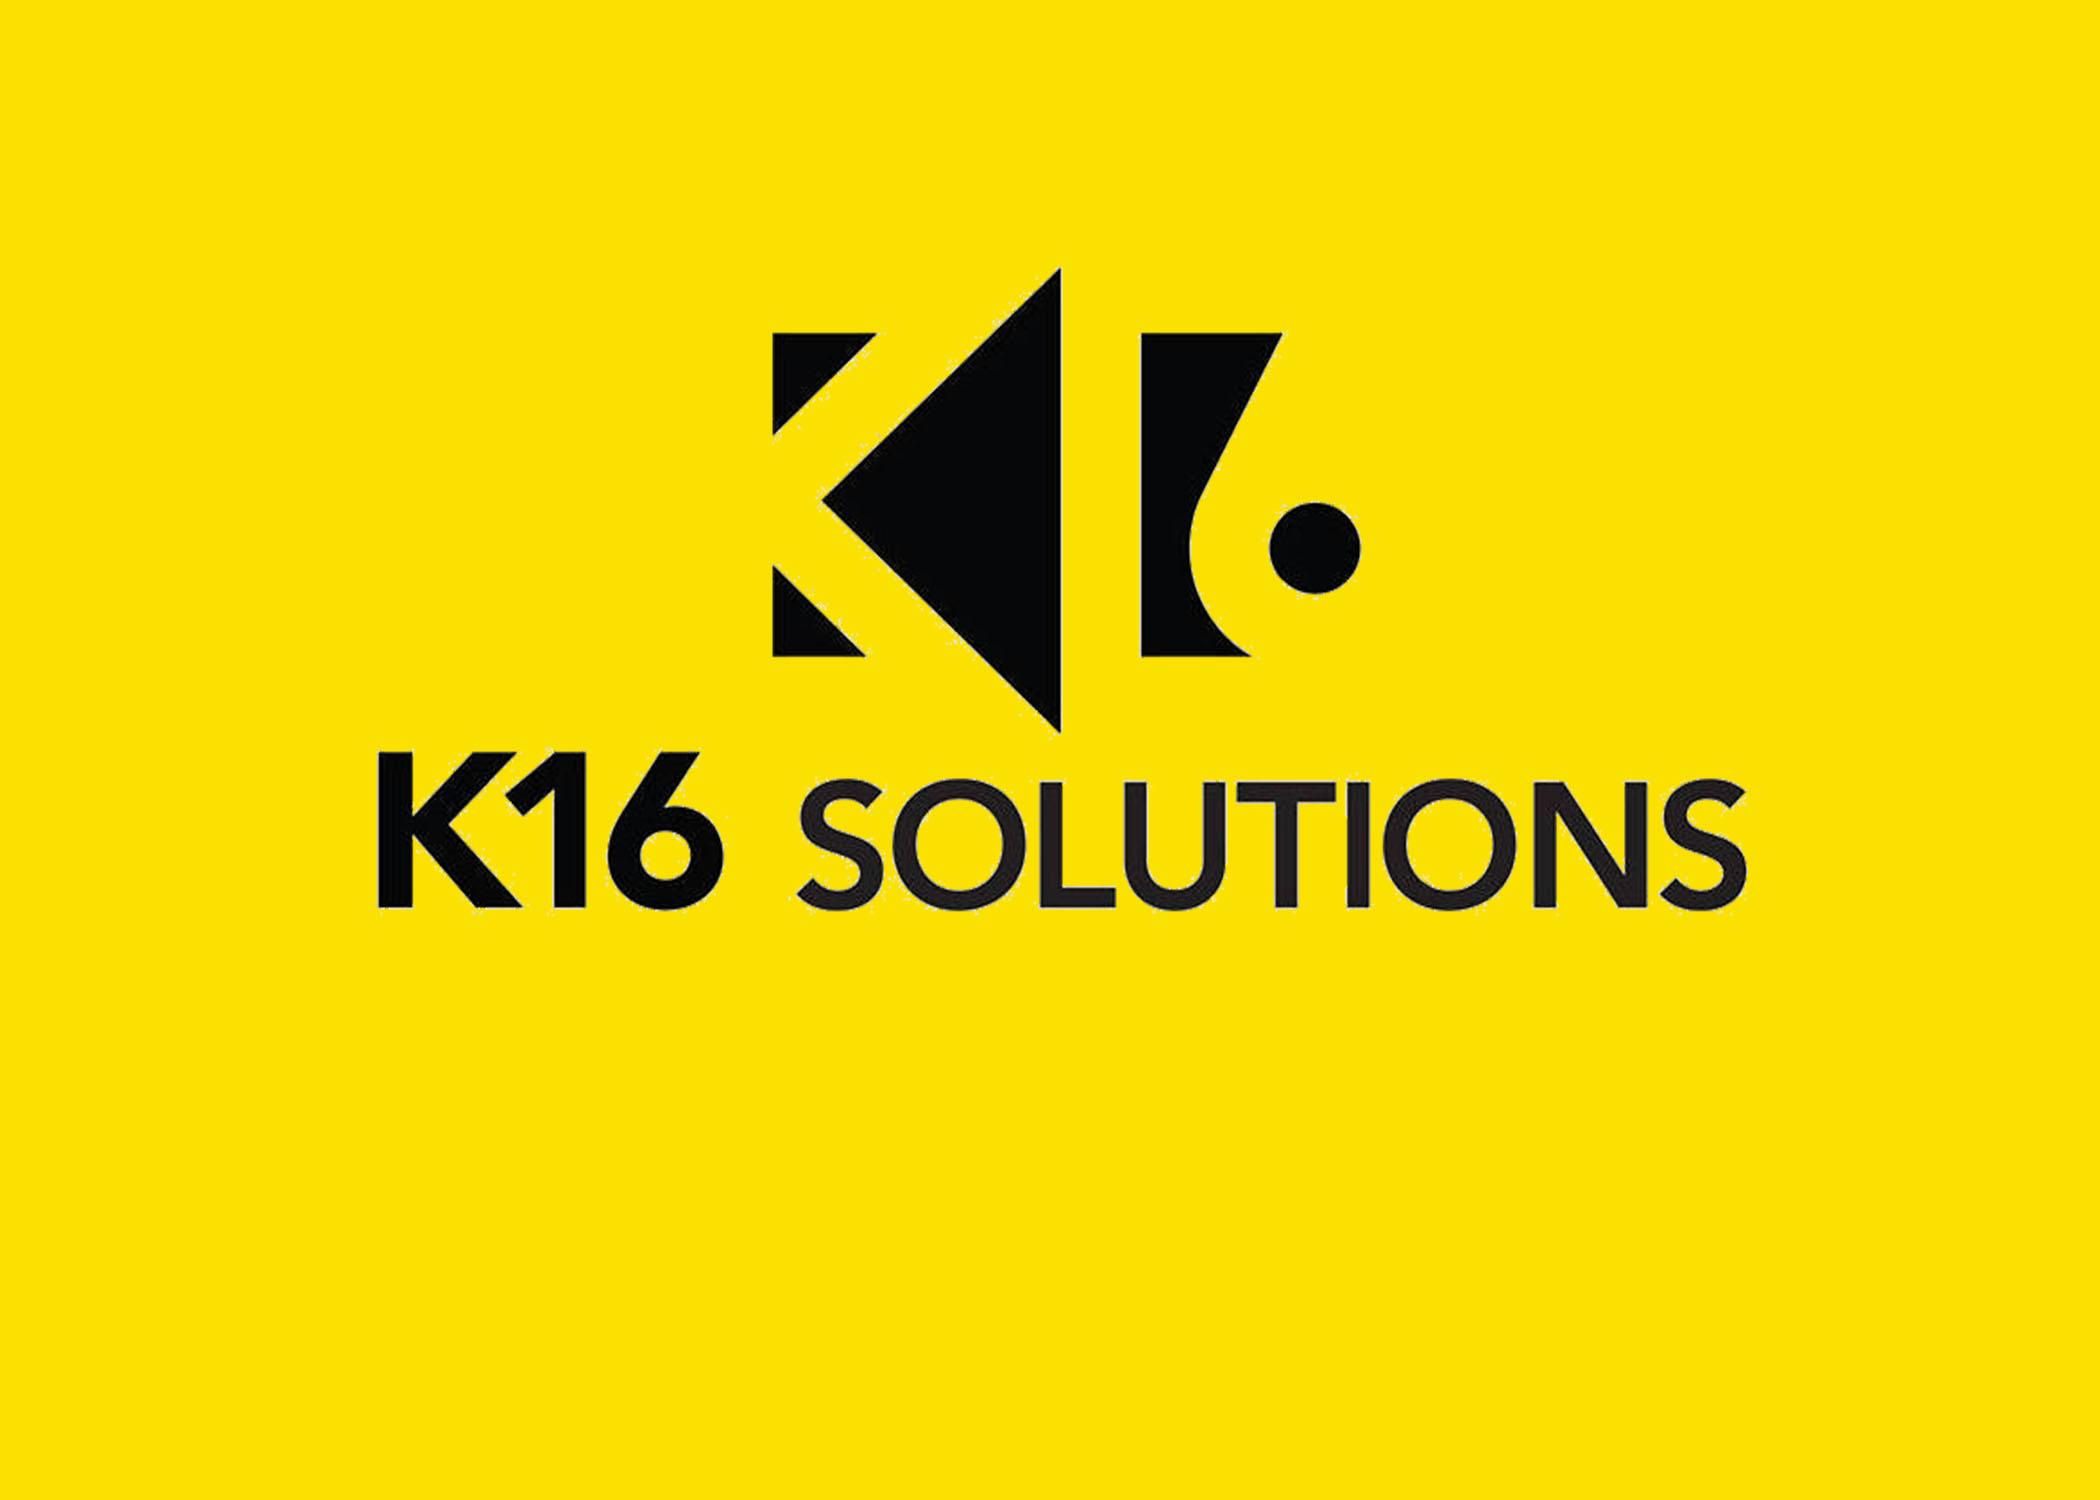 K16 Solutions